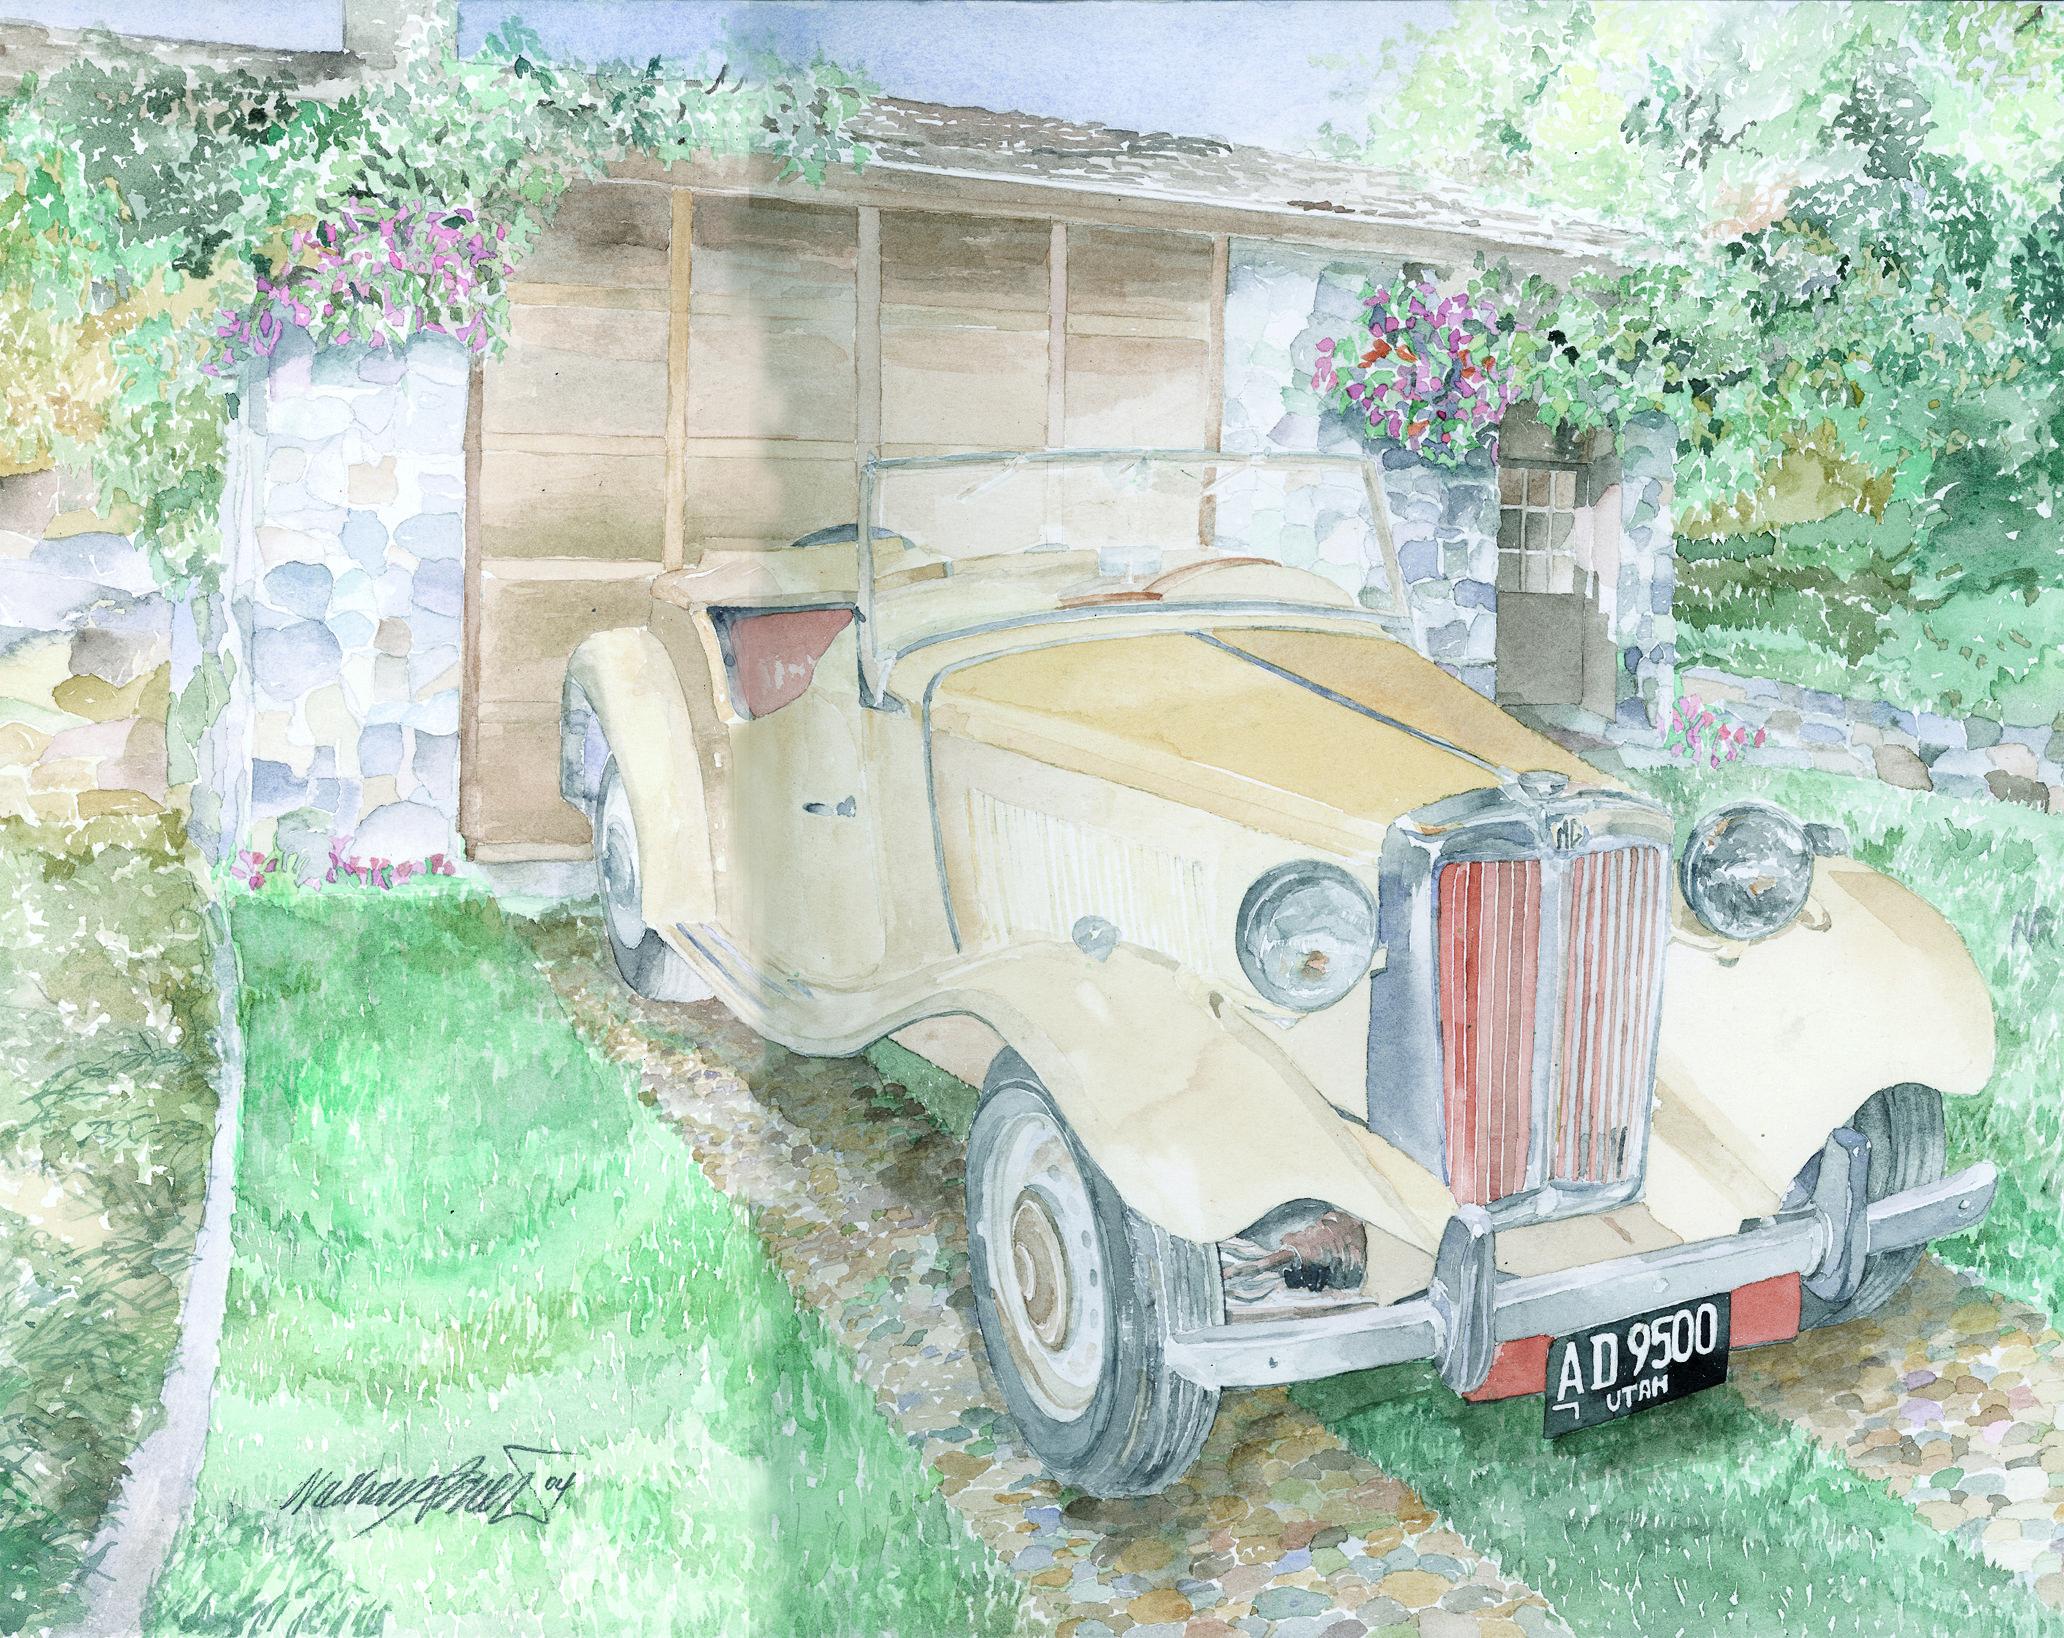 MG Car Rory